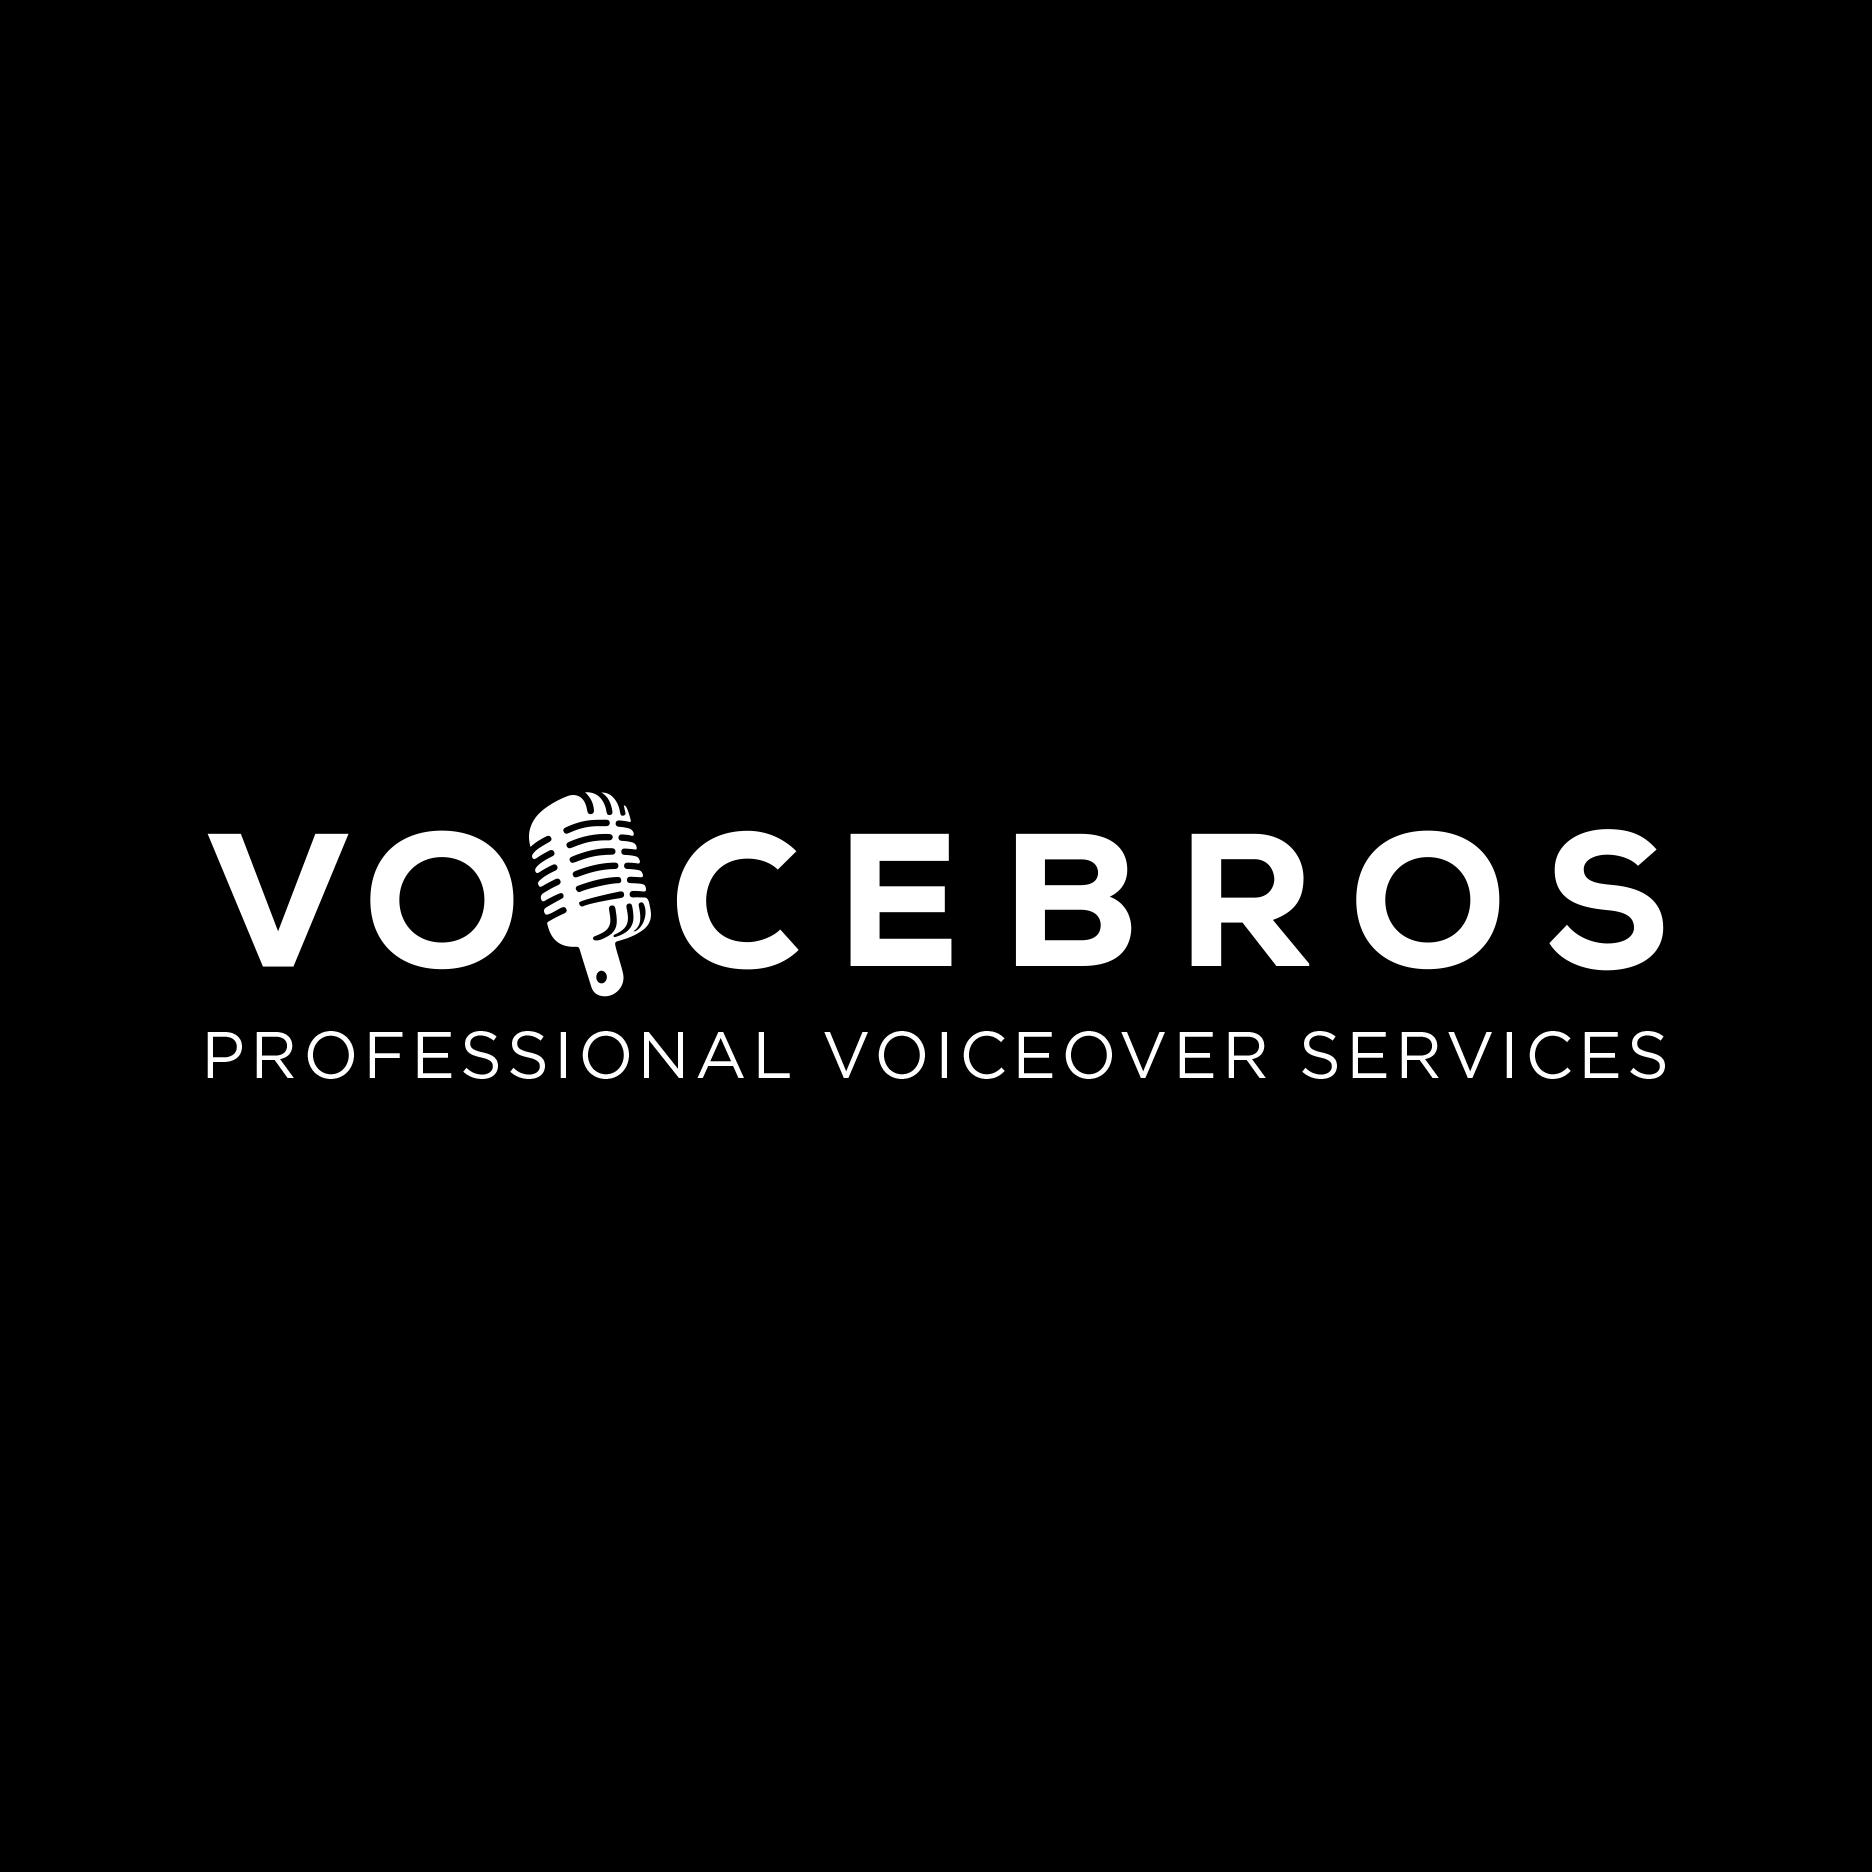 Masaya Okubo is a voice over actor